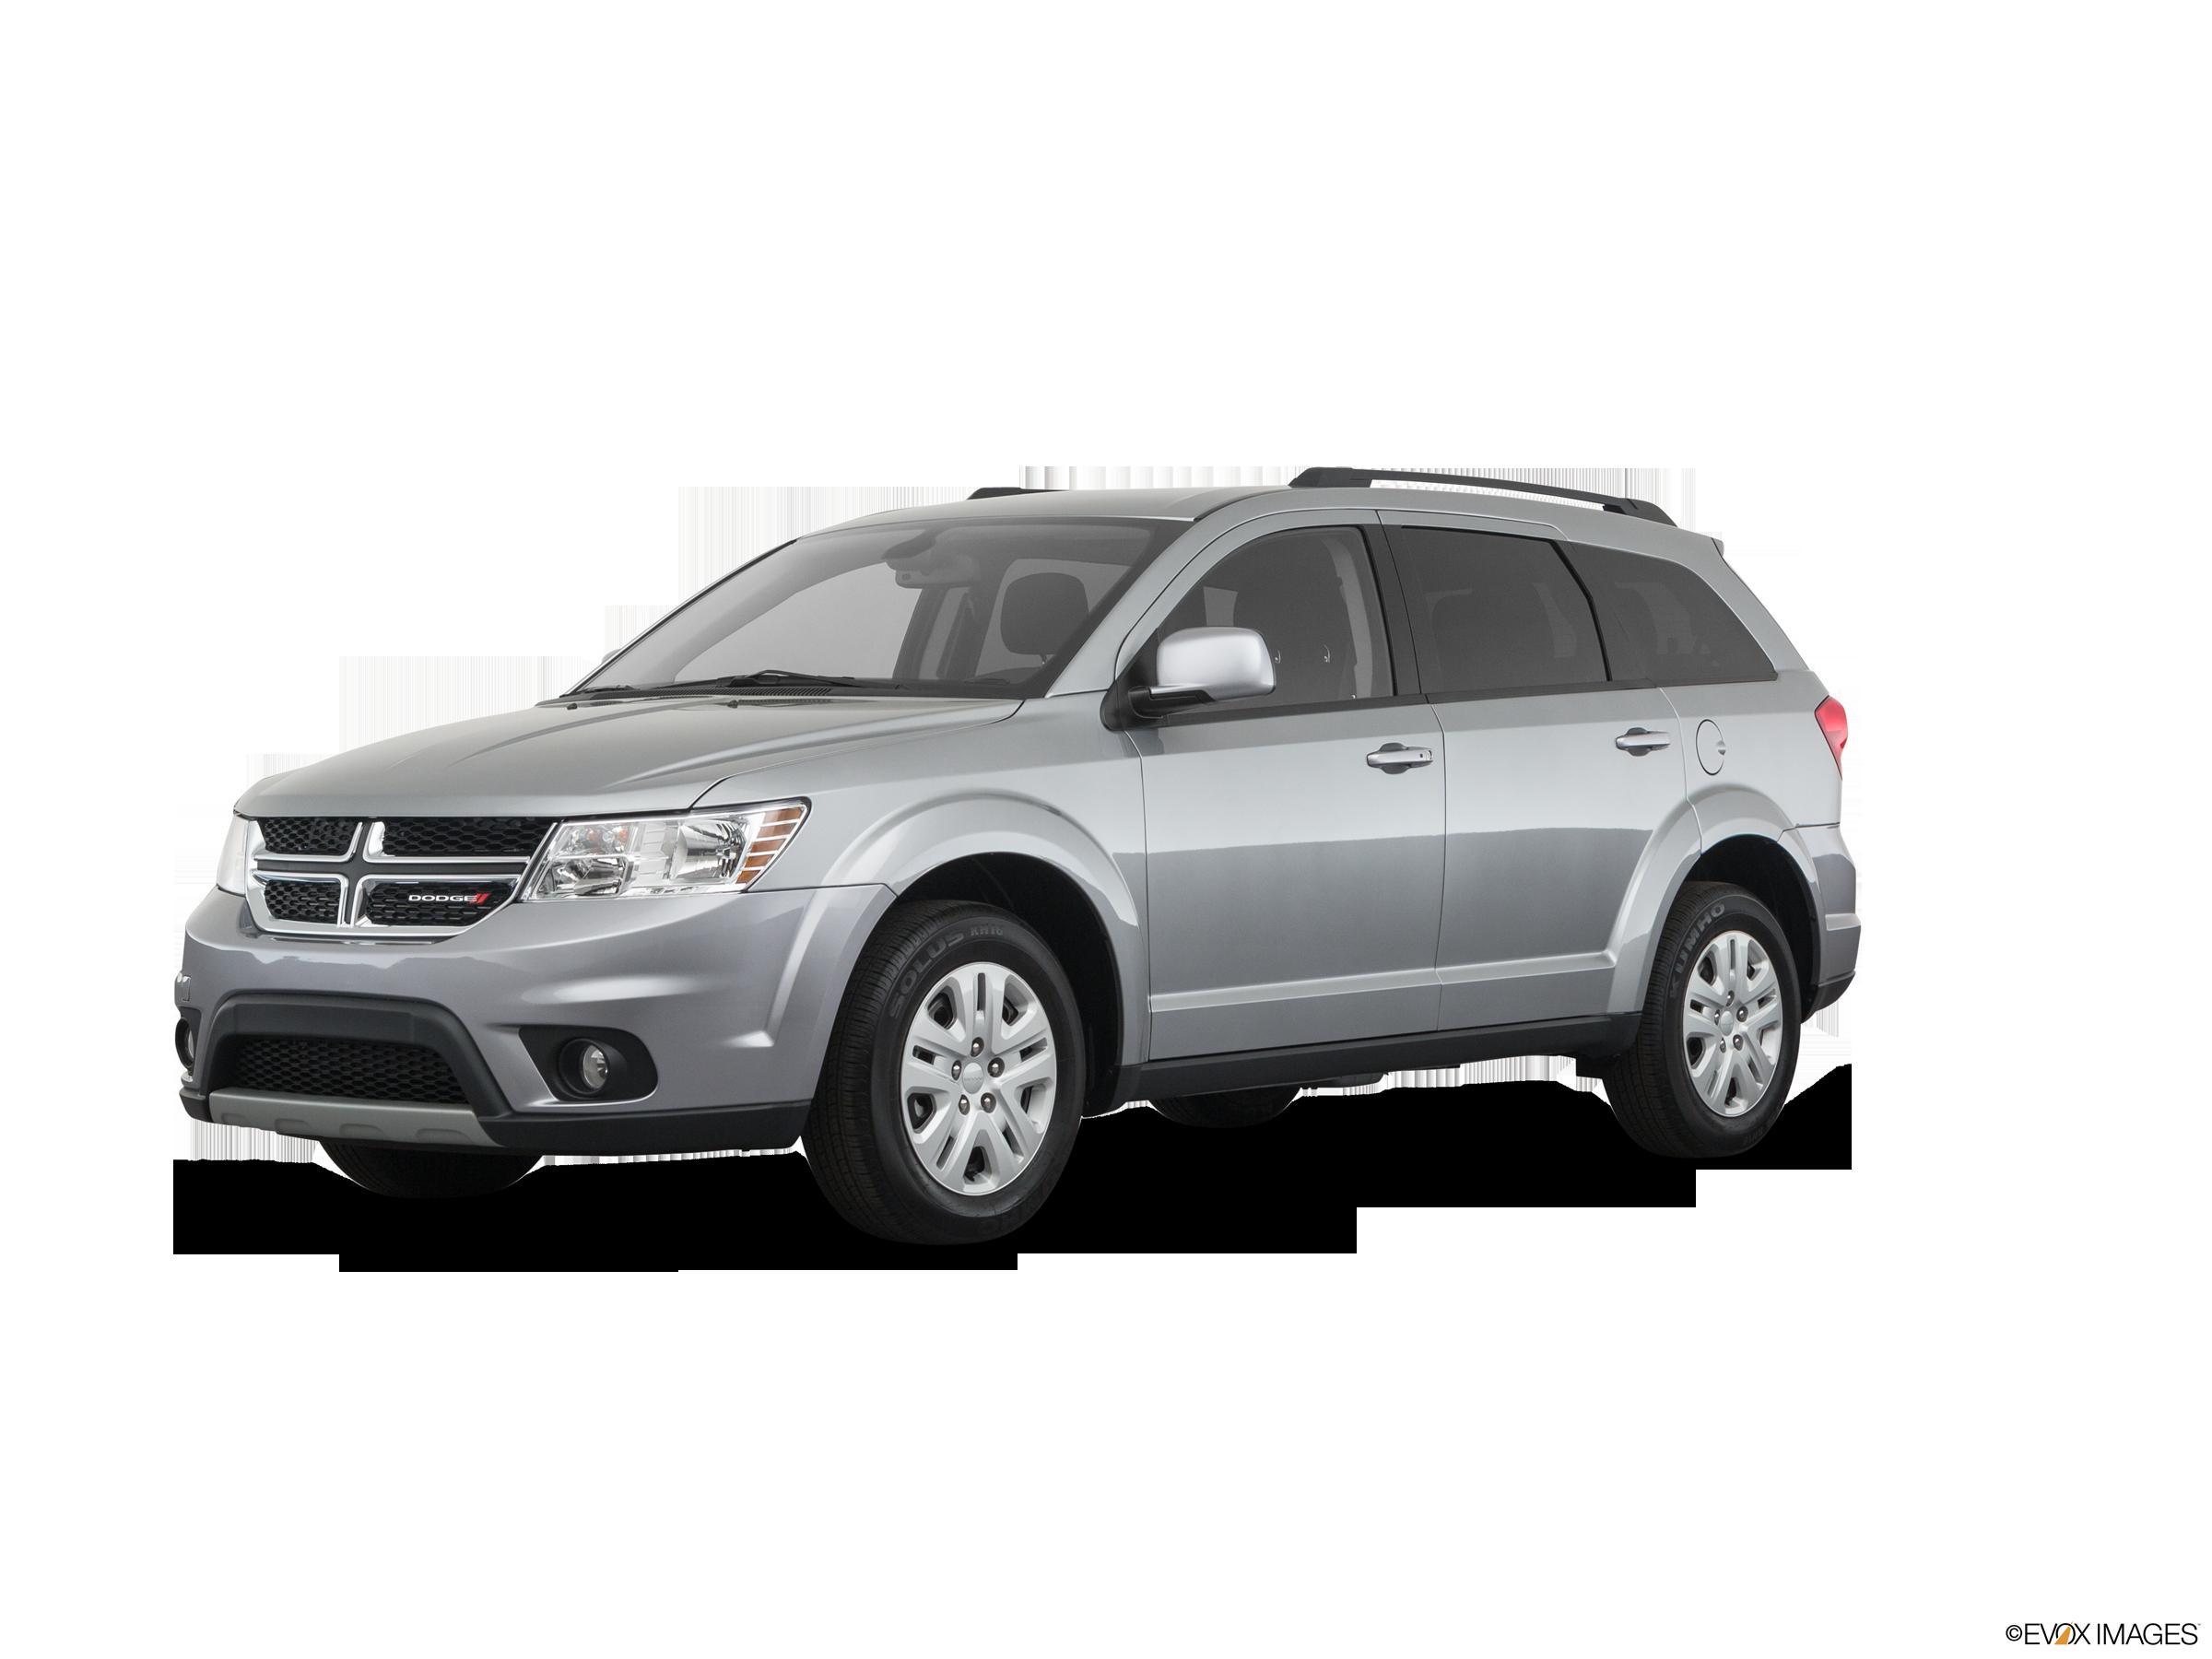 Dodge Journey Mpg >> 2019 Dodge Journey Pricing Ratings Expert Review Kelley Blue Book